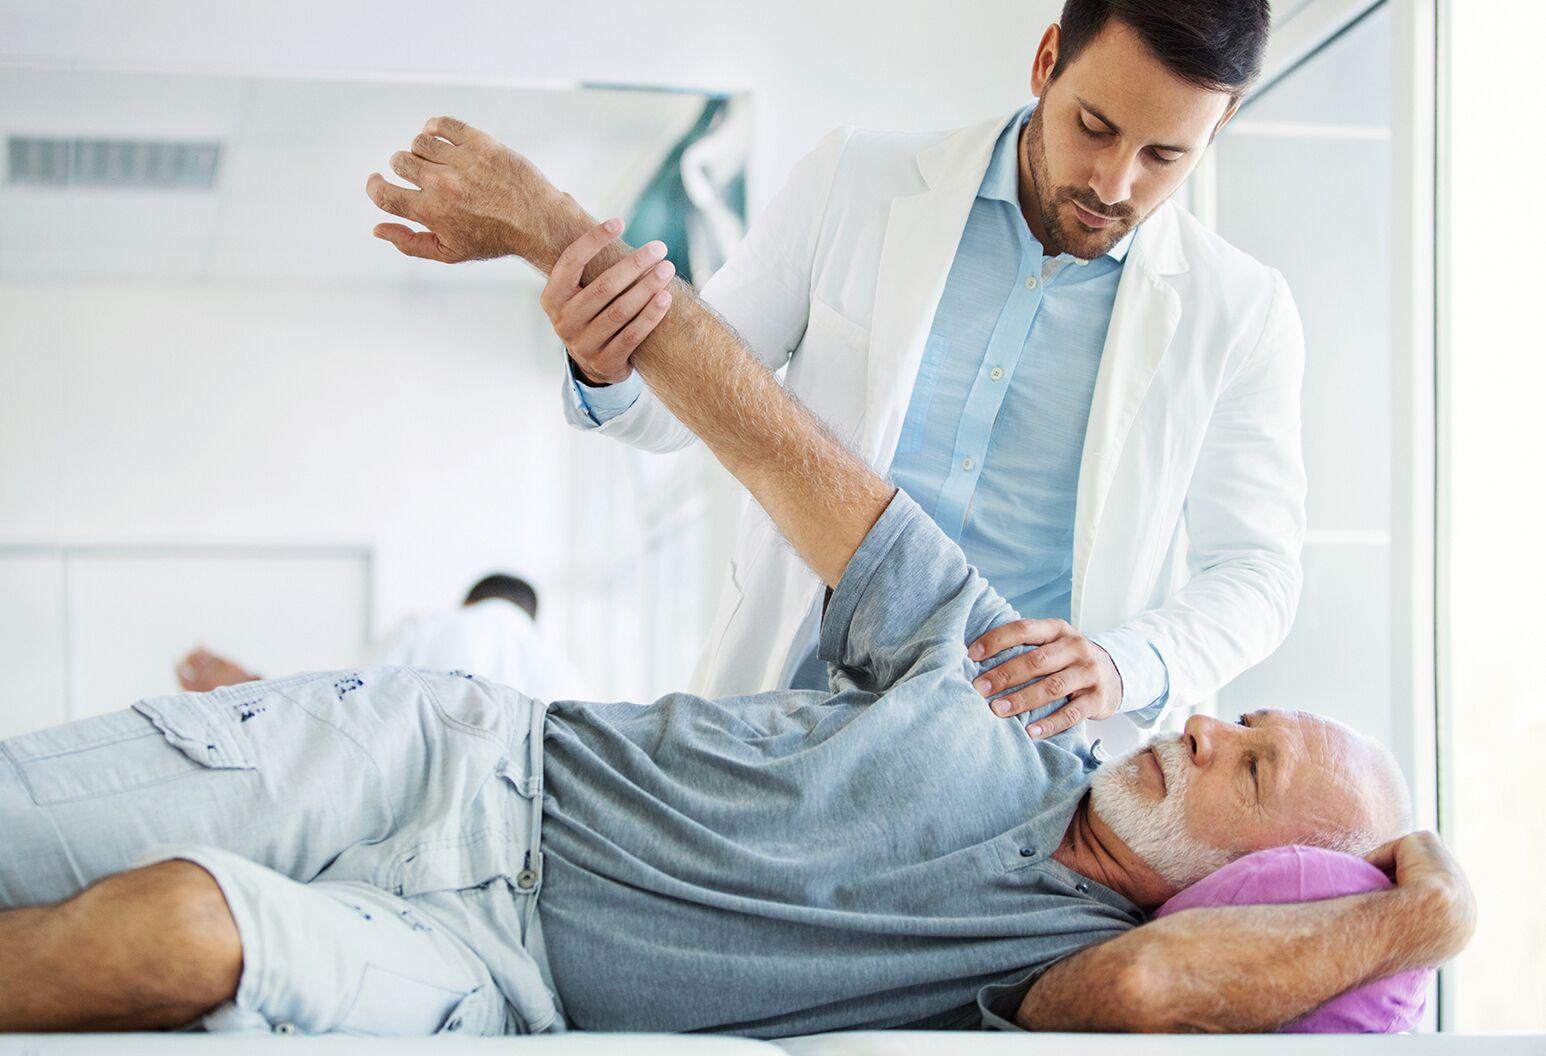 Orlin & Cohen Orthopedic Group at Merrick | Northwell Health